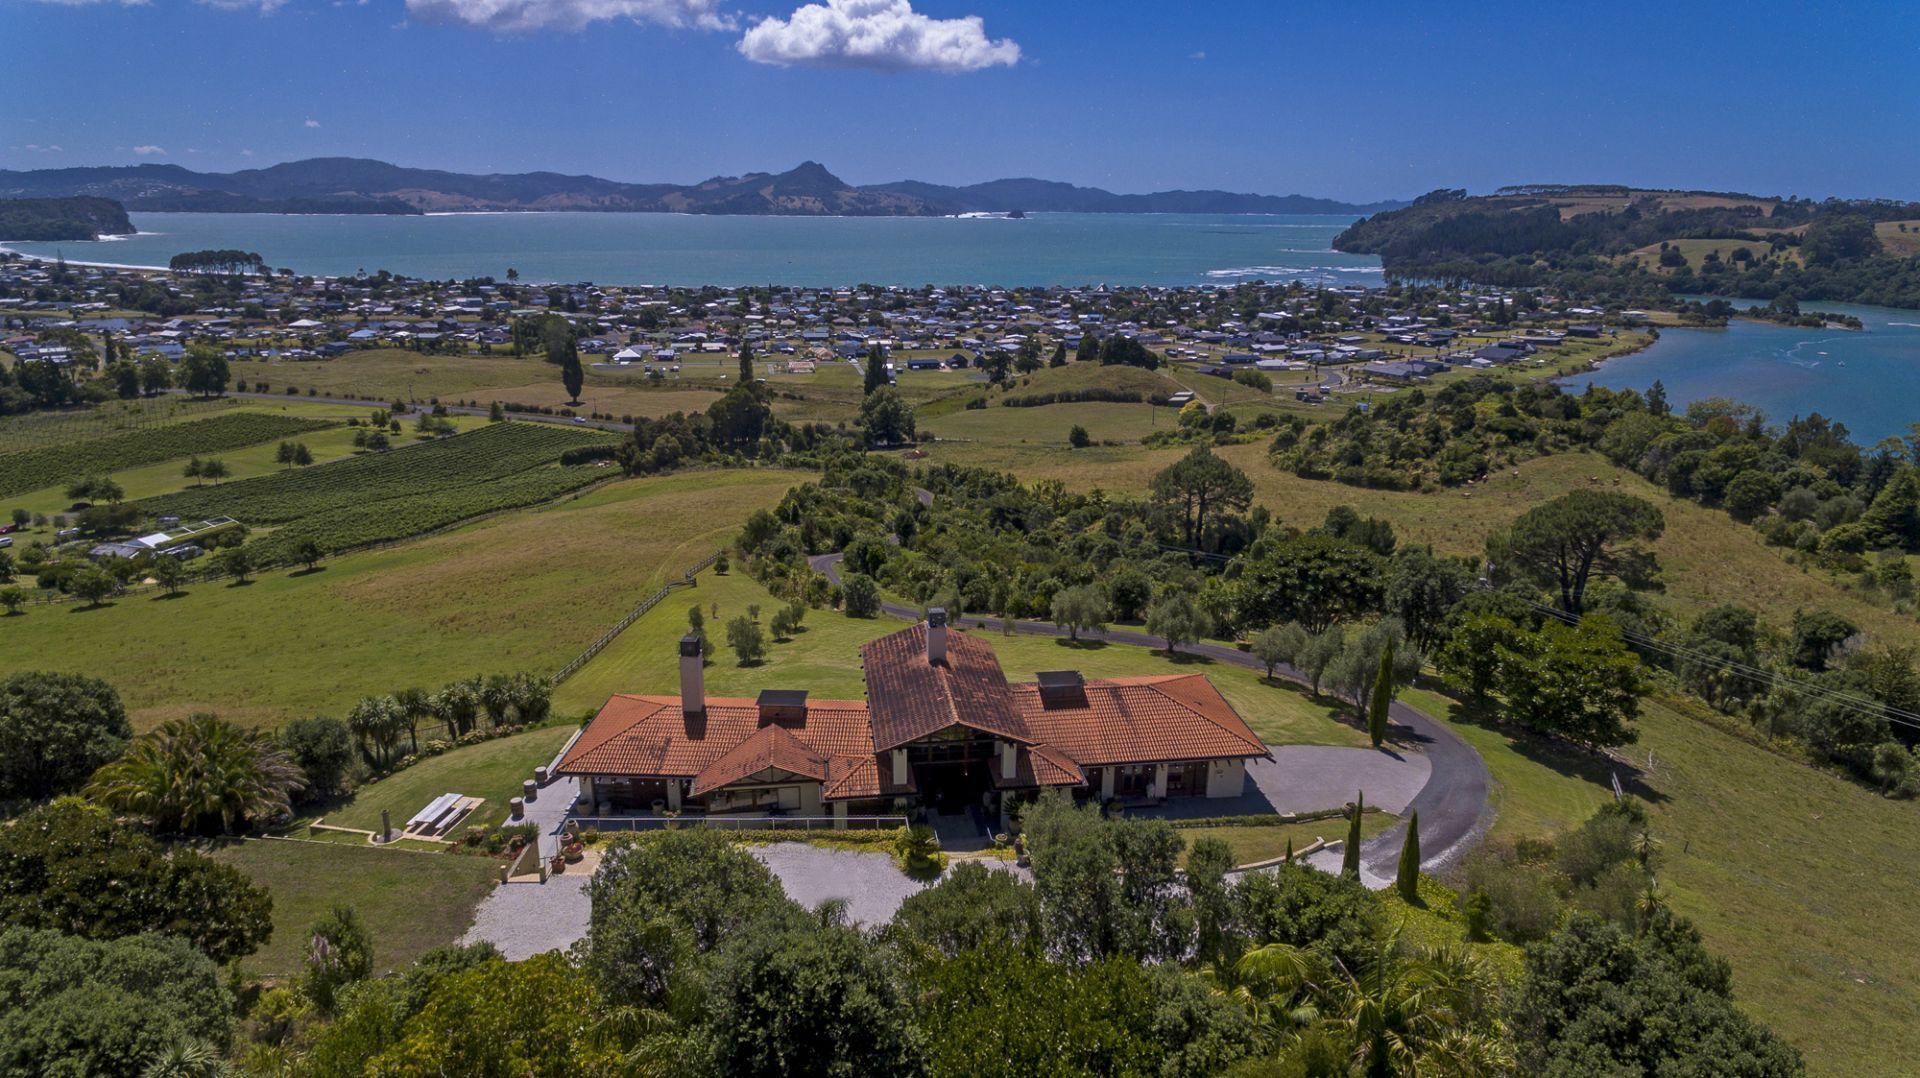 Mercury Ridge villa and view